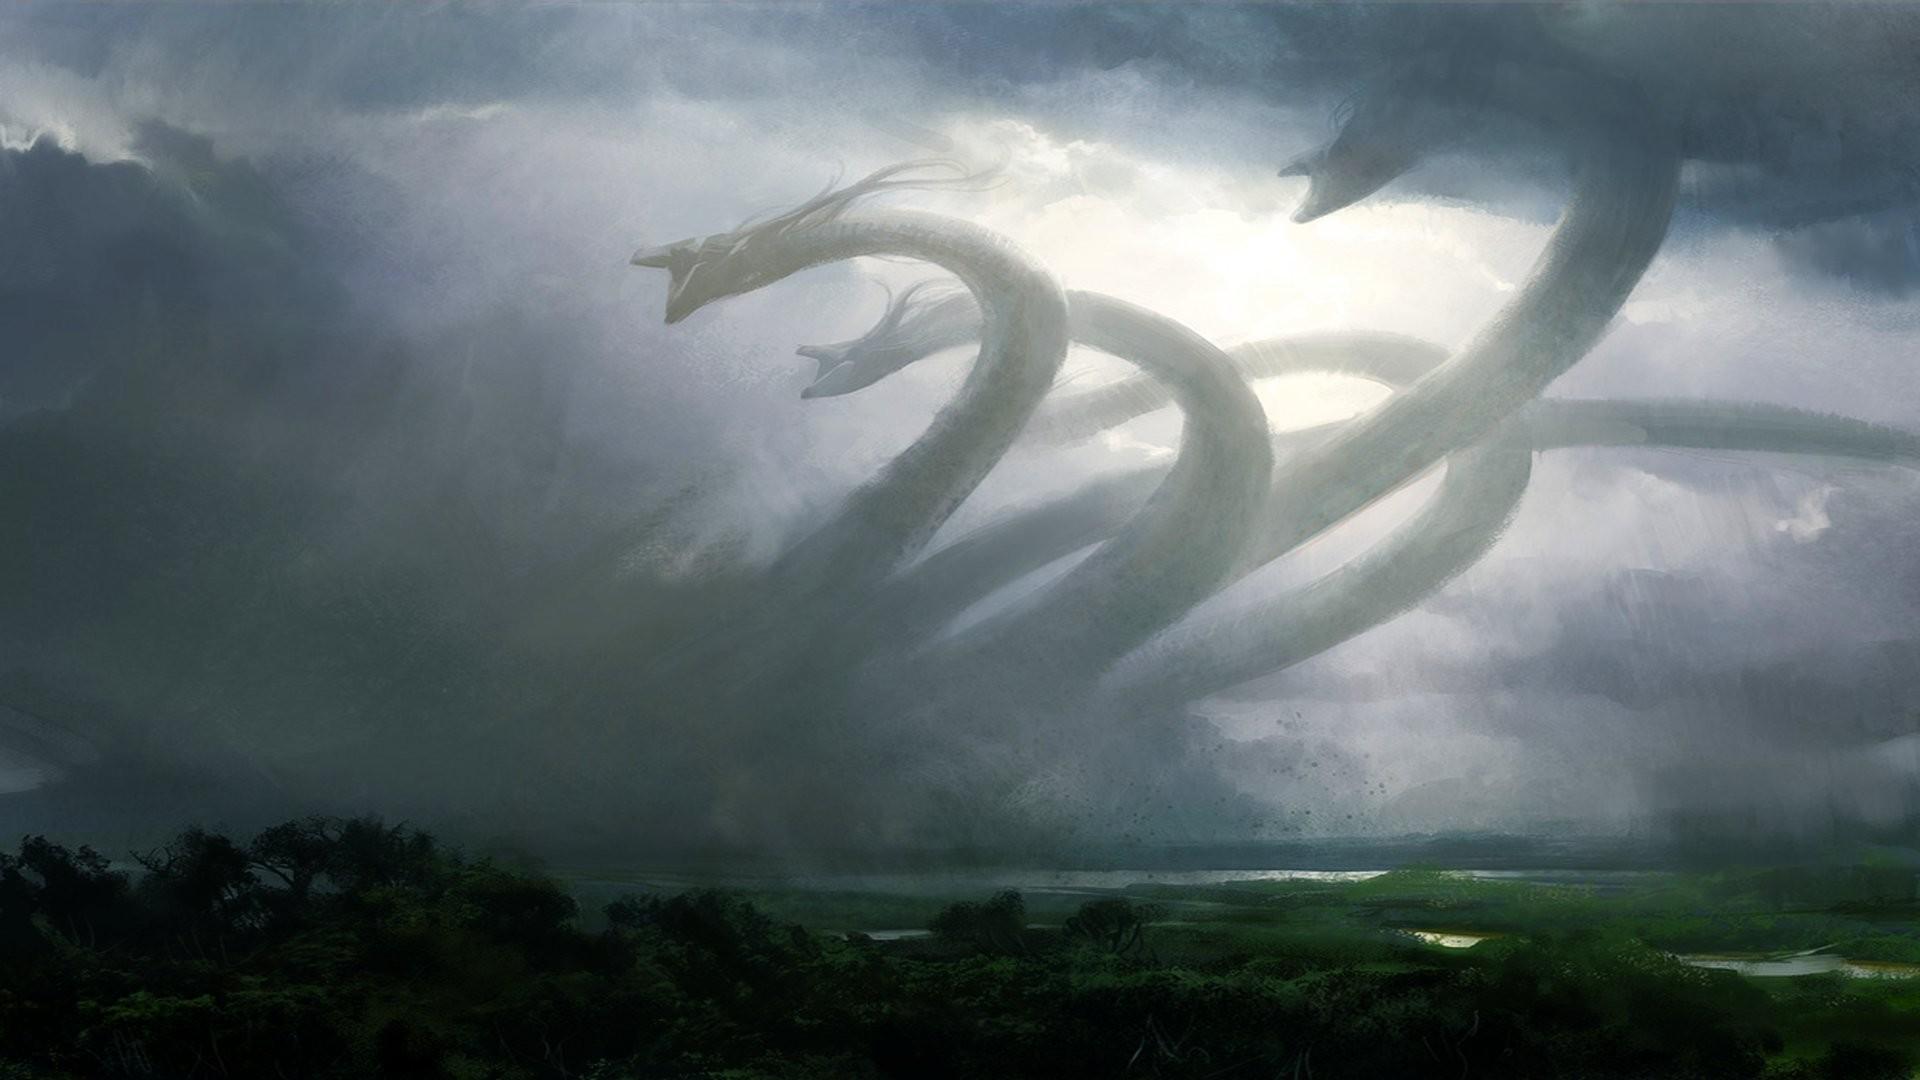 Storm Dragons Computer Wallpapers, Desktop Backgrounds | .